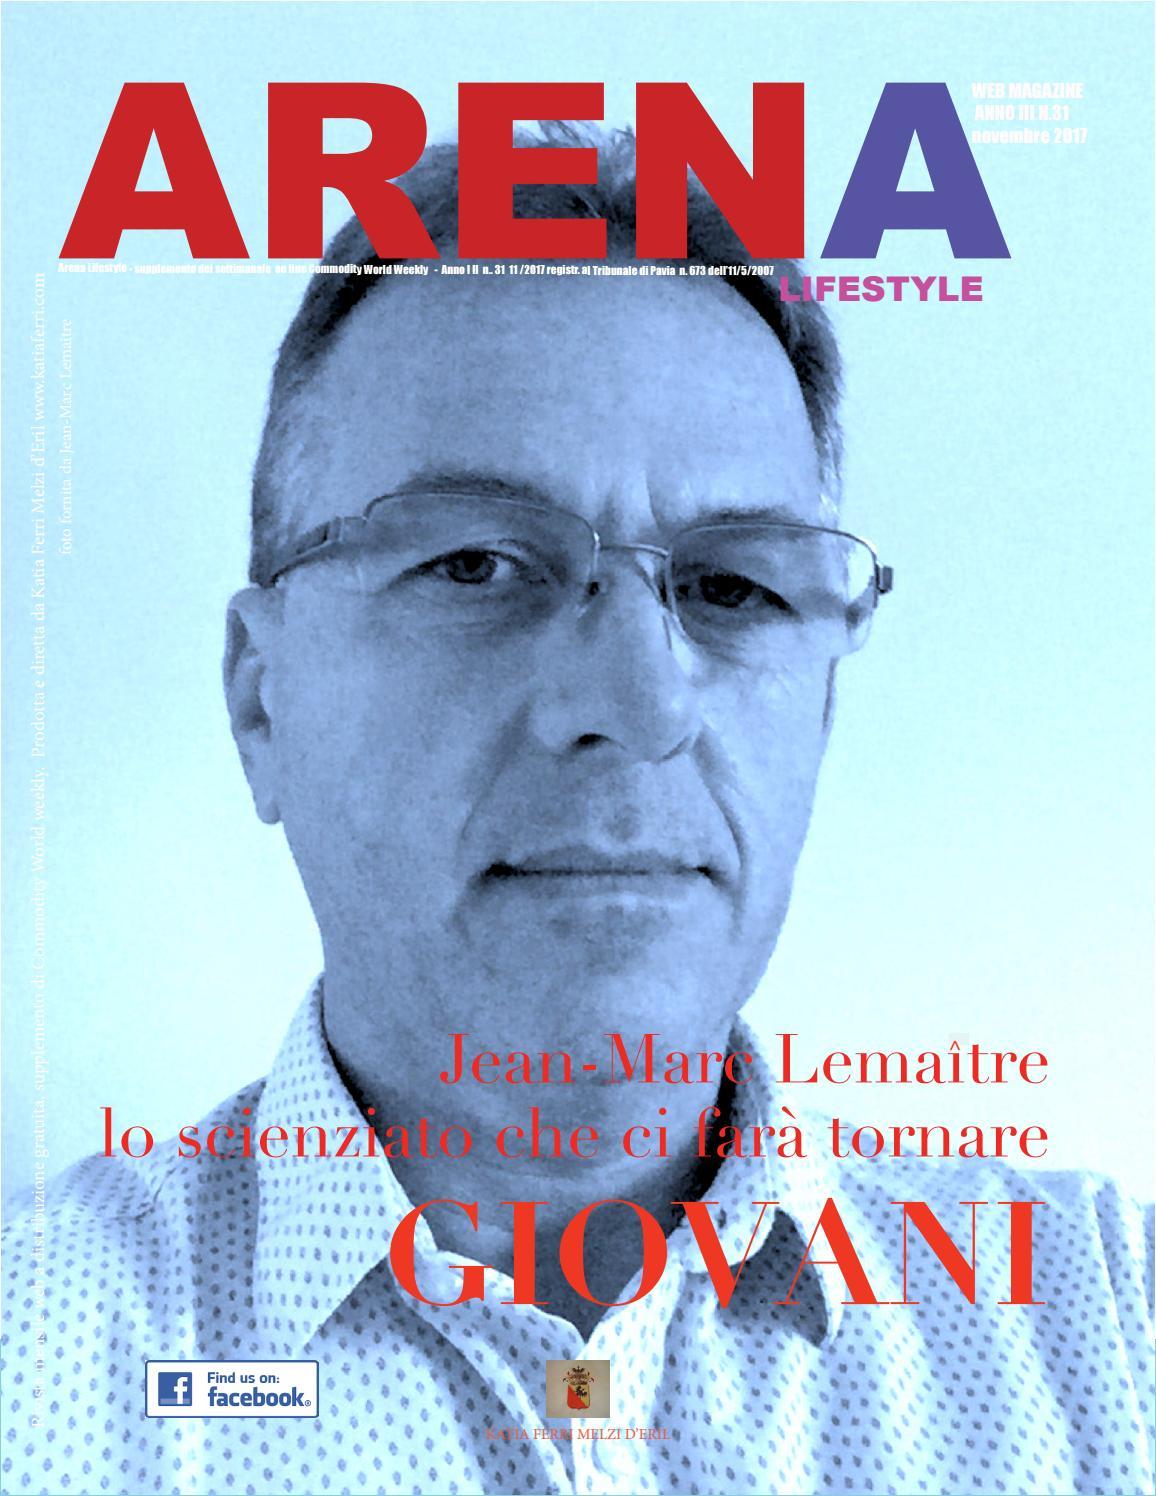 Arena lifestyle 11 17 by katia Ferri Melzi d Eril - issuu a440ef7c7b8